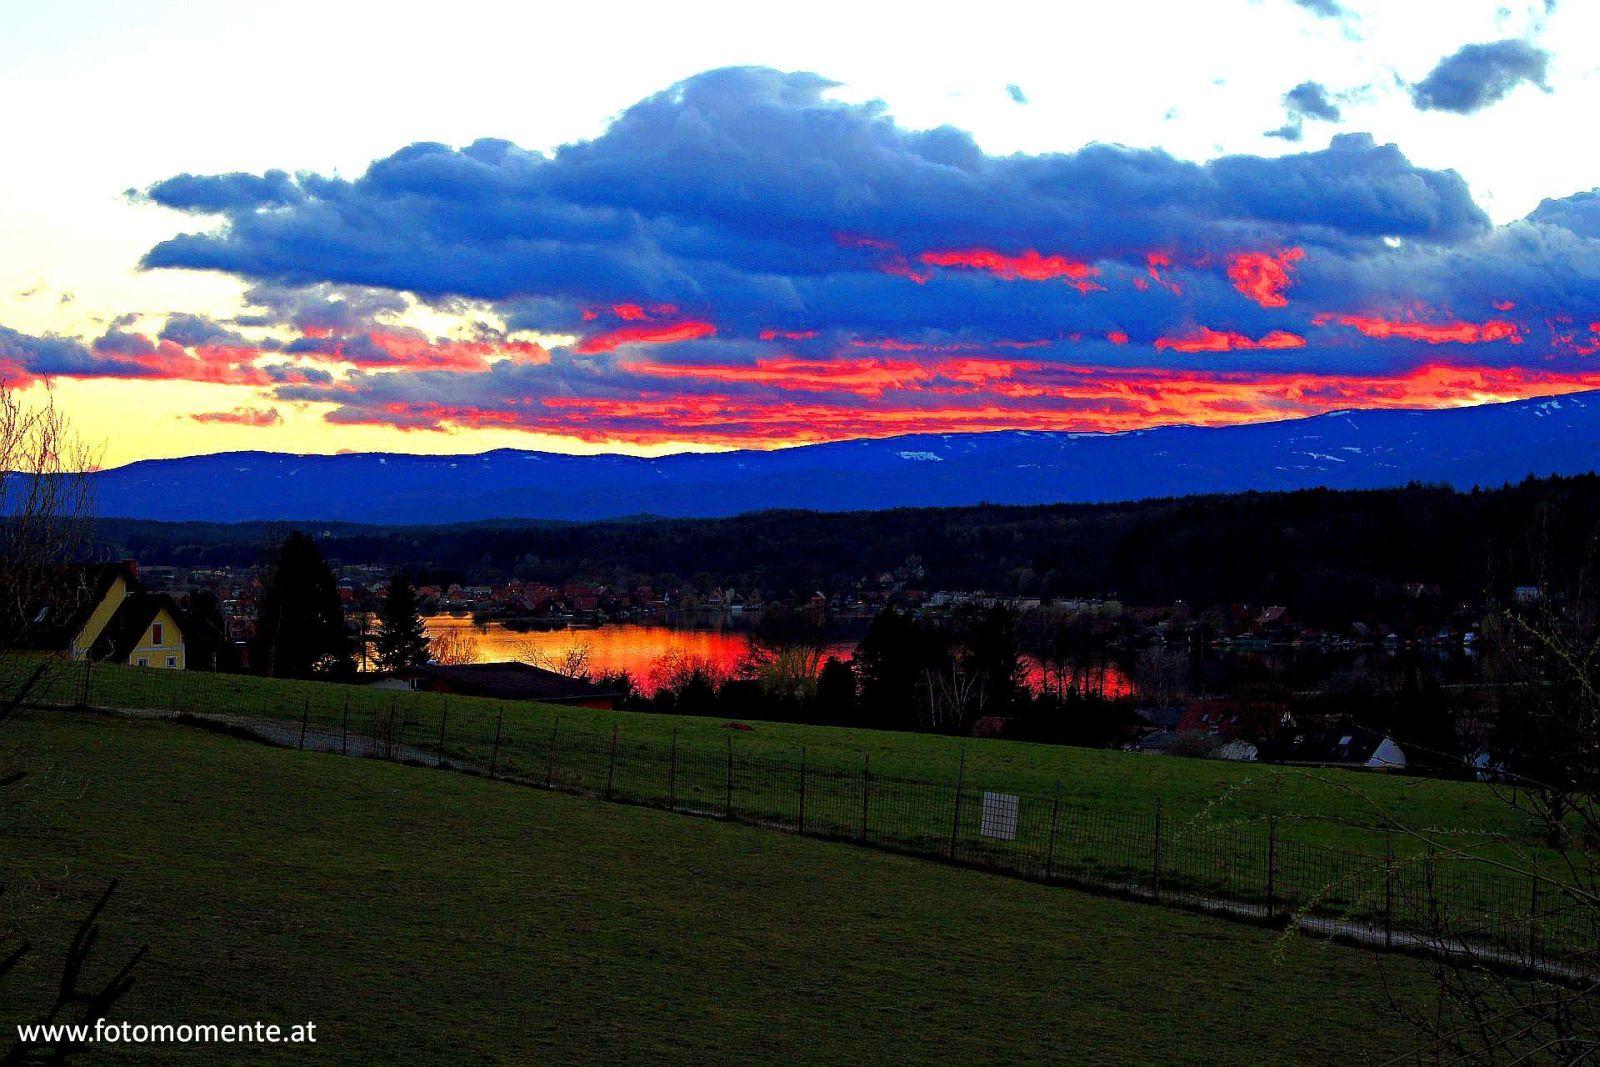 abendrötung am waldschacher see3 - Abendrötung am Waldschacher-See